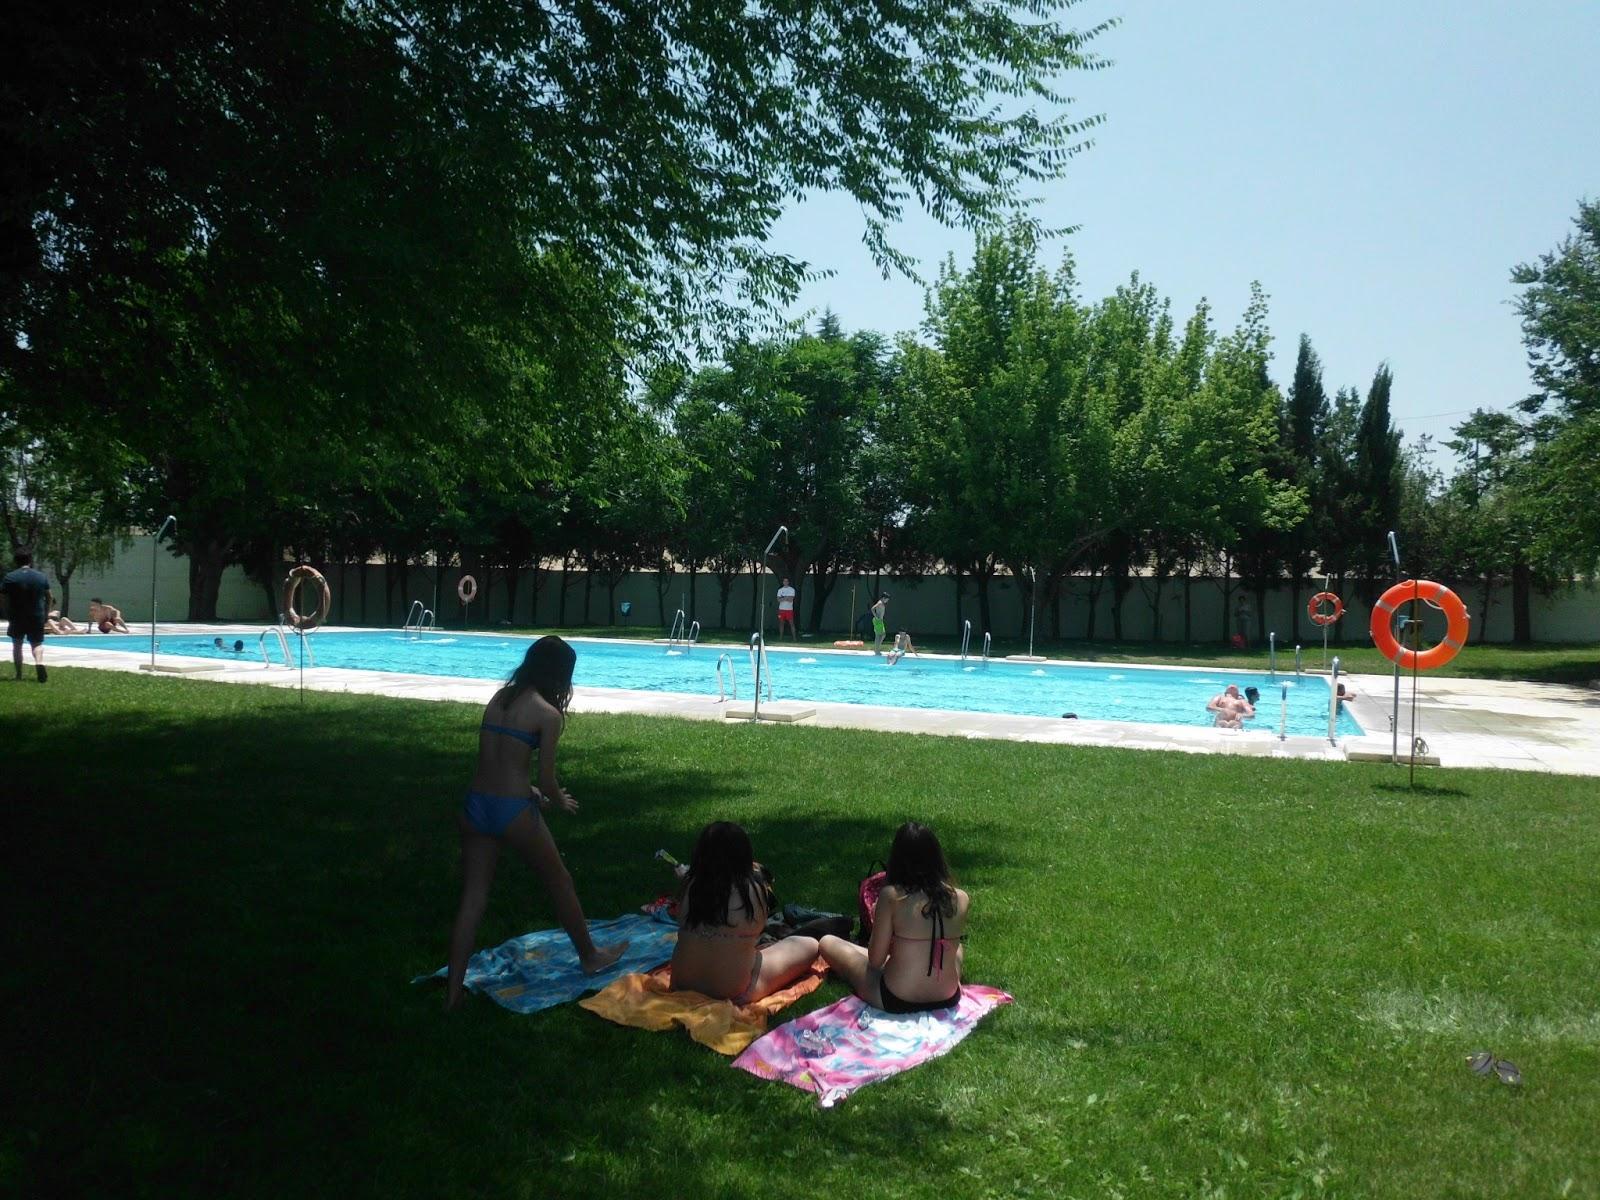 Un pueblo de leyenda fuente obejuna abre su piscina municipal for Piscina municipal cordoba